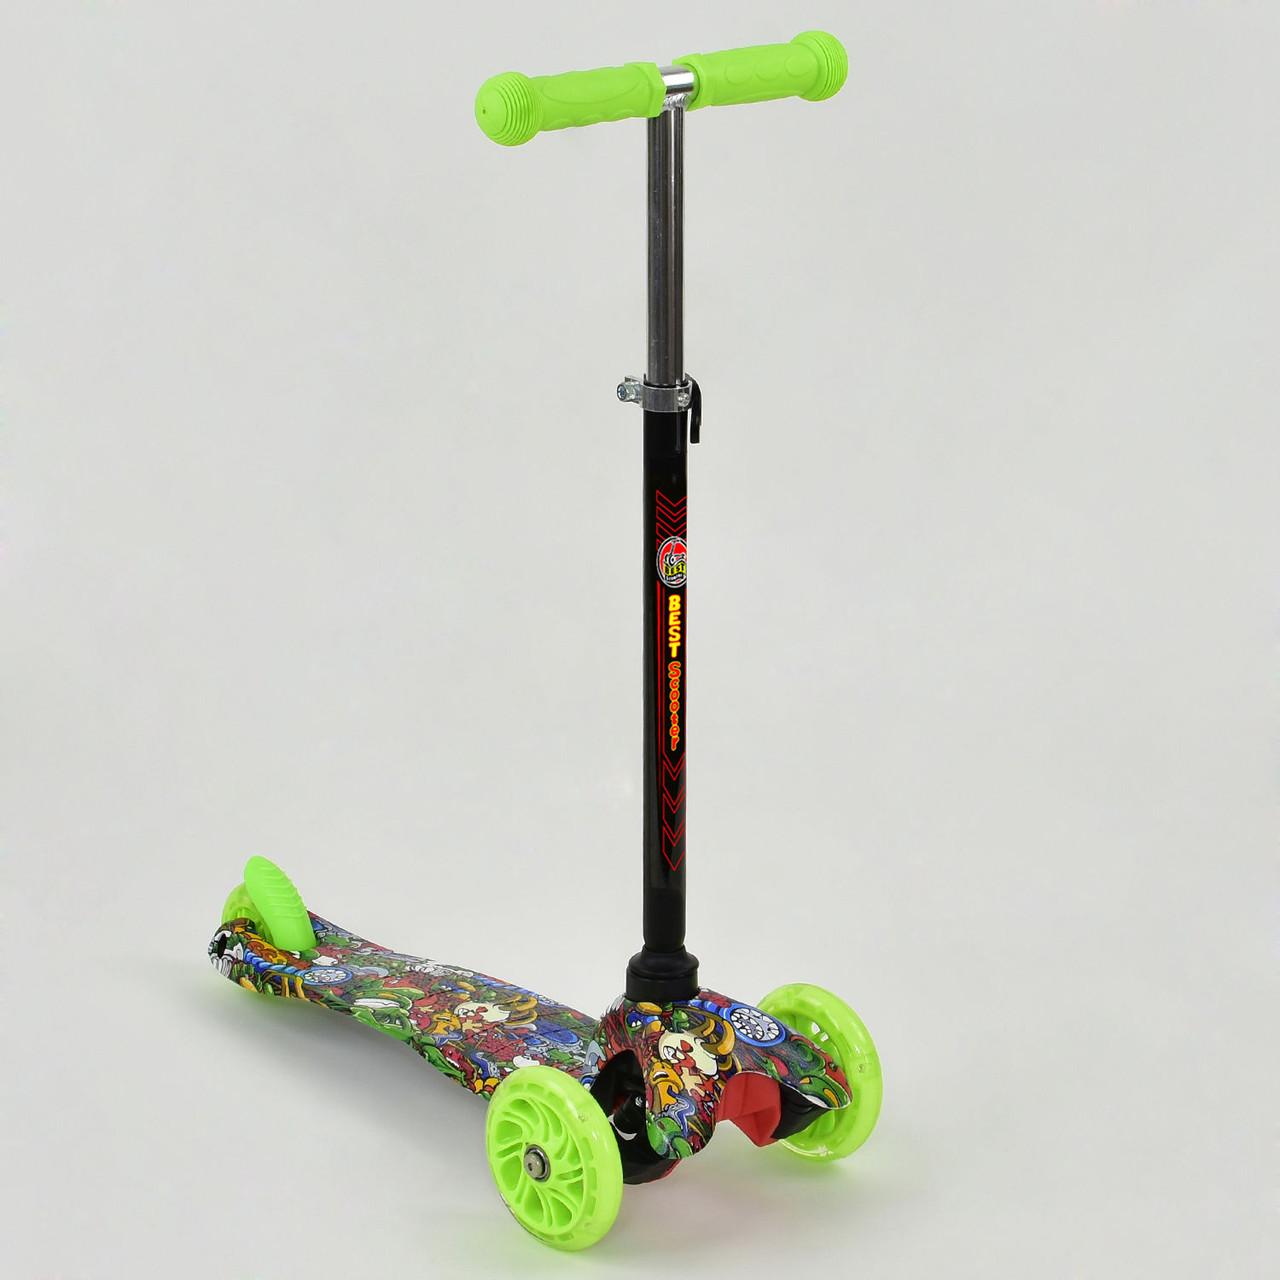 Самокат А 24690 /779-1201 MINI Best Scooter Светящиеся колеса PU Гарантия качества Быстрая доставка